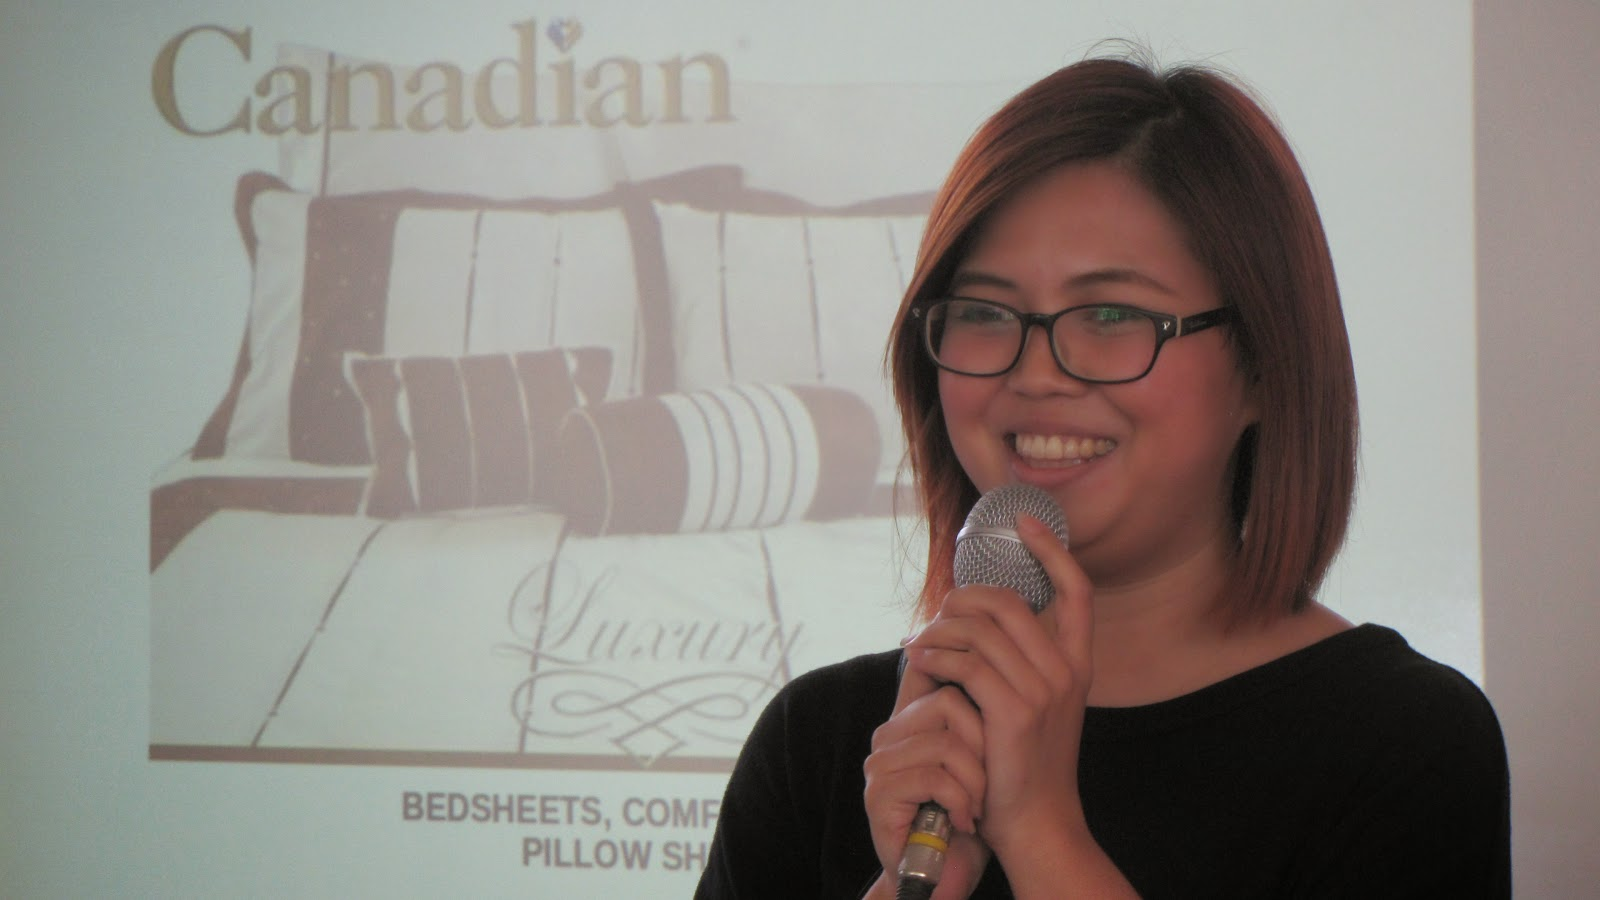 Canadian Beddings, Uratex Cebu